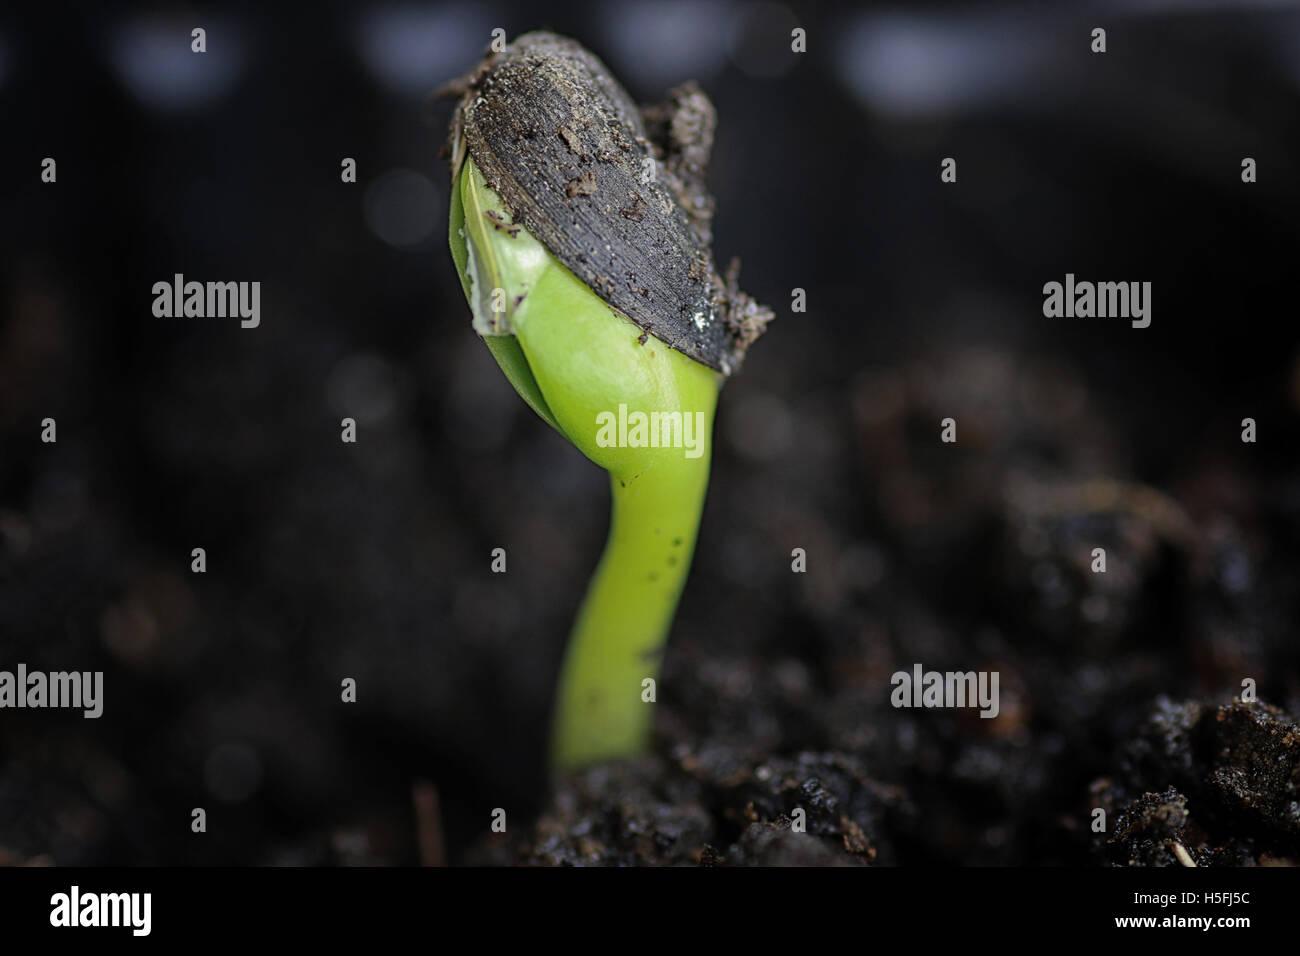 kleinen Spross aus Samen Stockbild